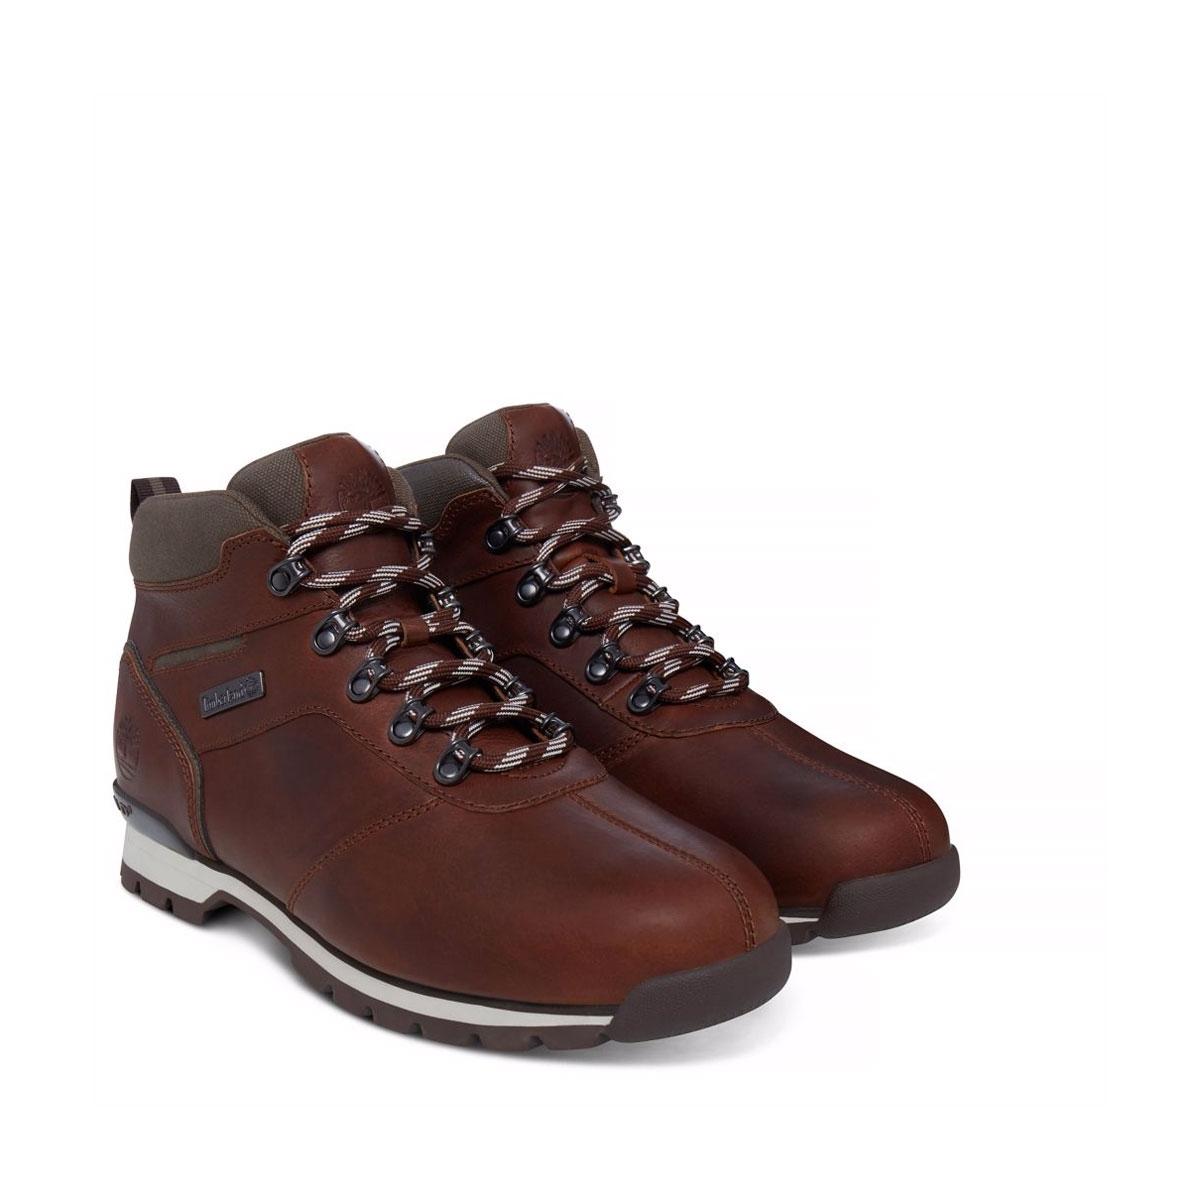 presenting skate shoes outlet online Timberland Splitrock 2 Hiker Walking Boots (Men's) - Medium Brown Full Grain